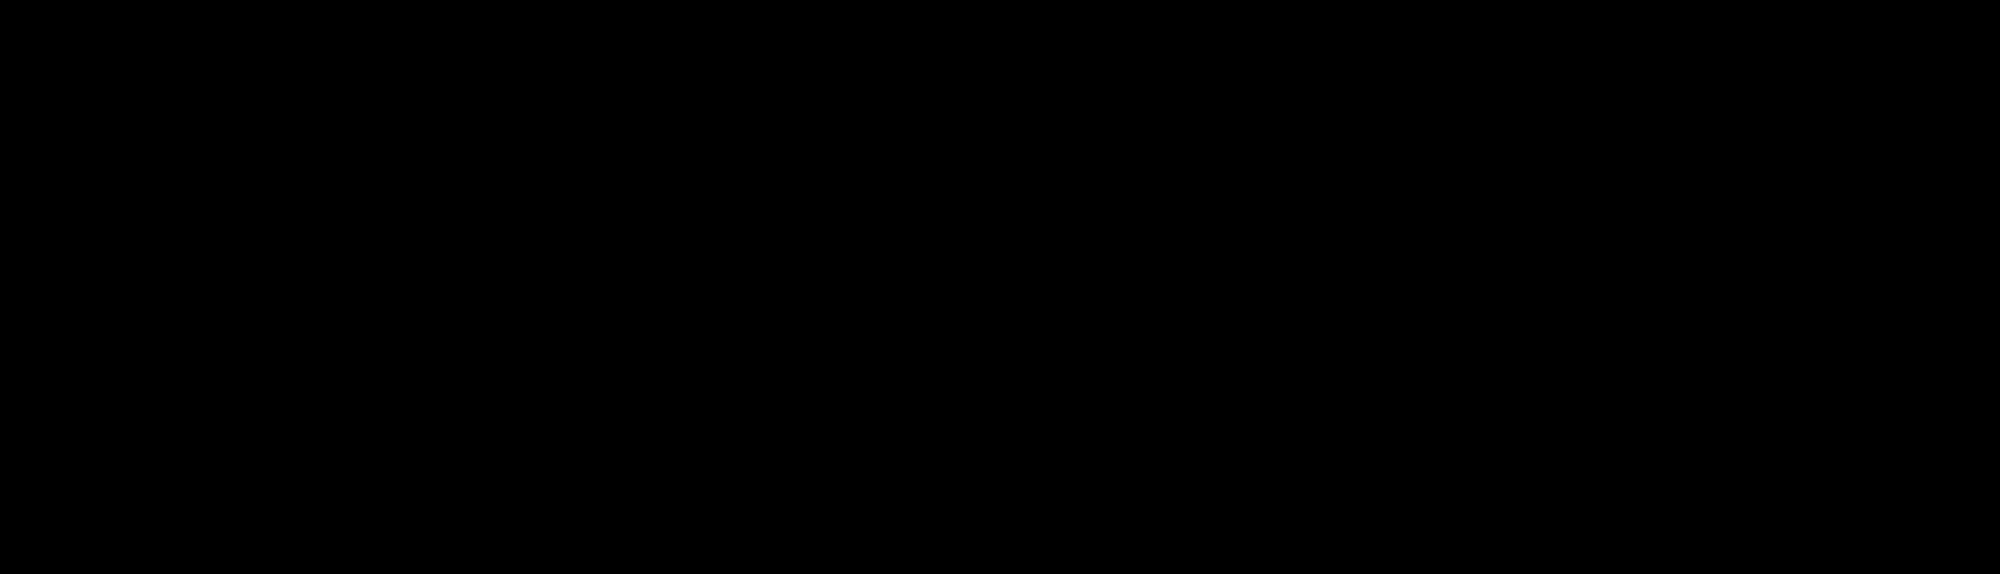 DIVALICIOUS Travel  Adventures-logo-black.png